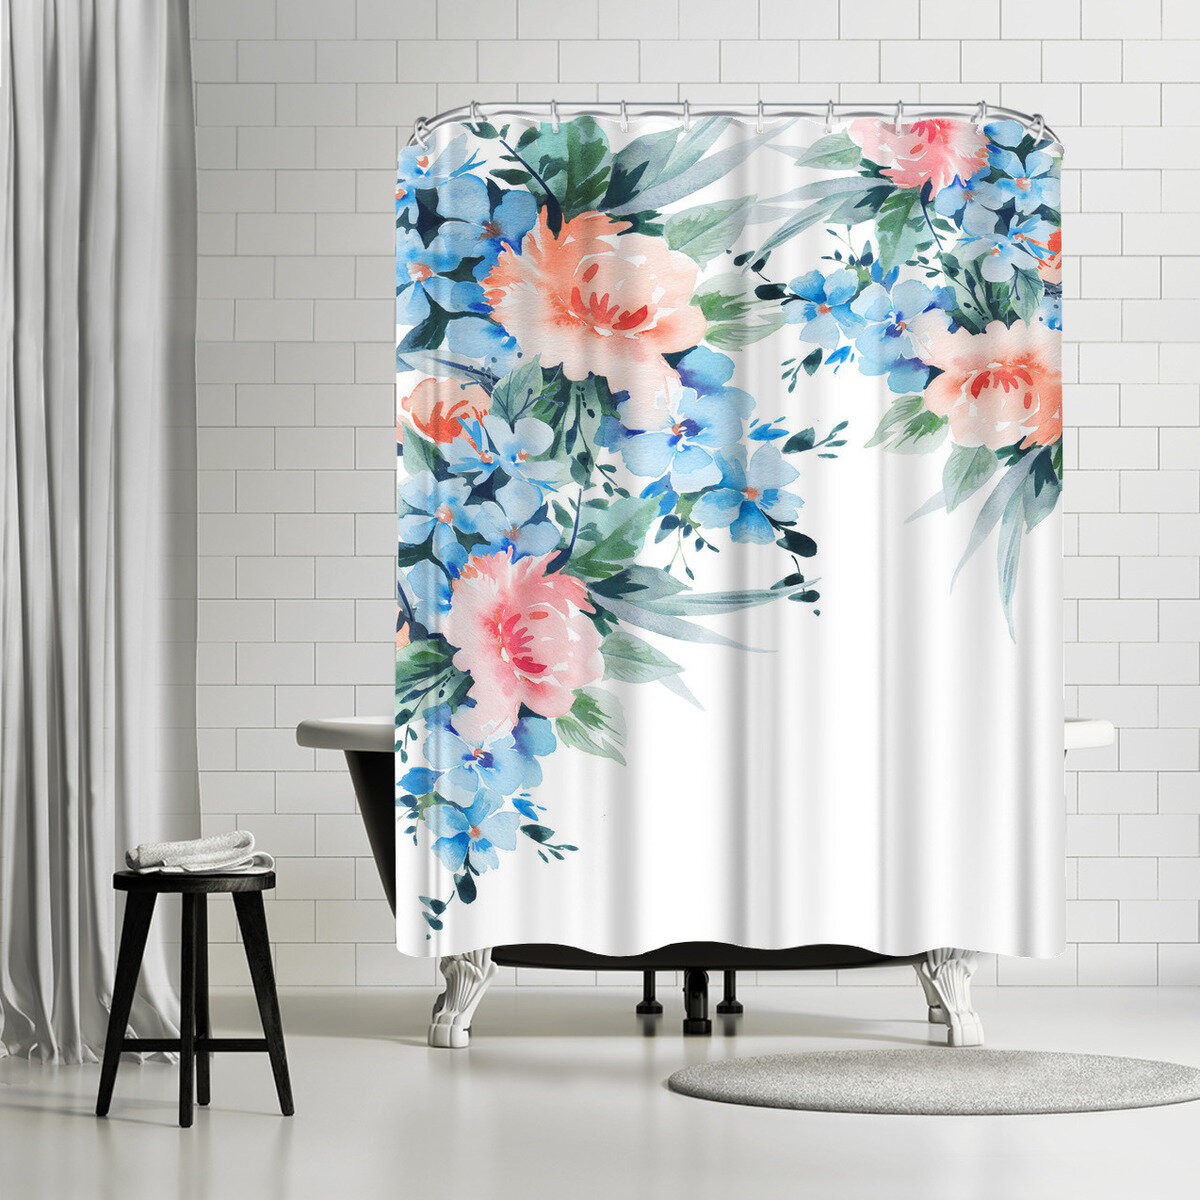 East Urban Home Victoria Nelson Blossom Bouquet Single Shower Curtain Wayfair